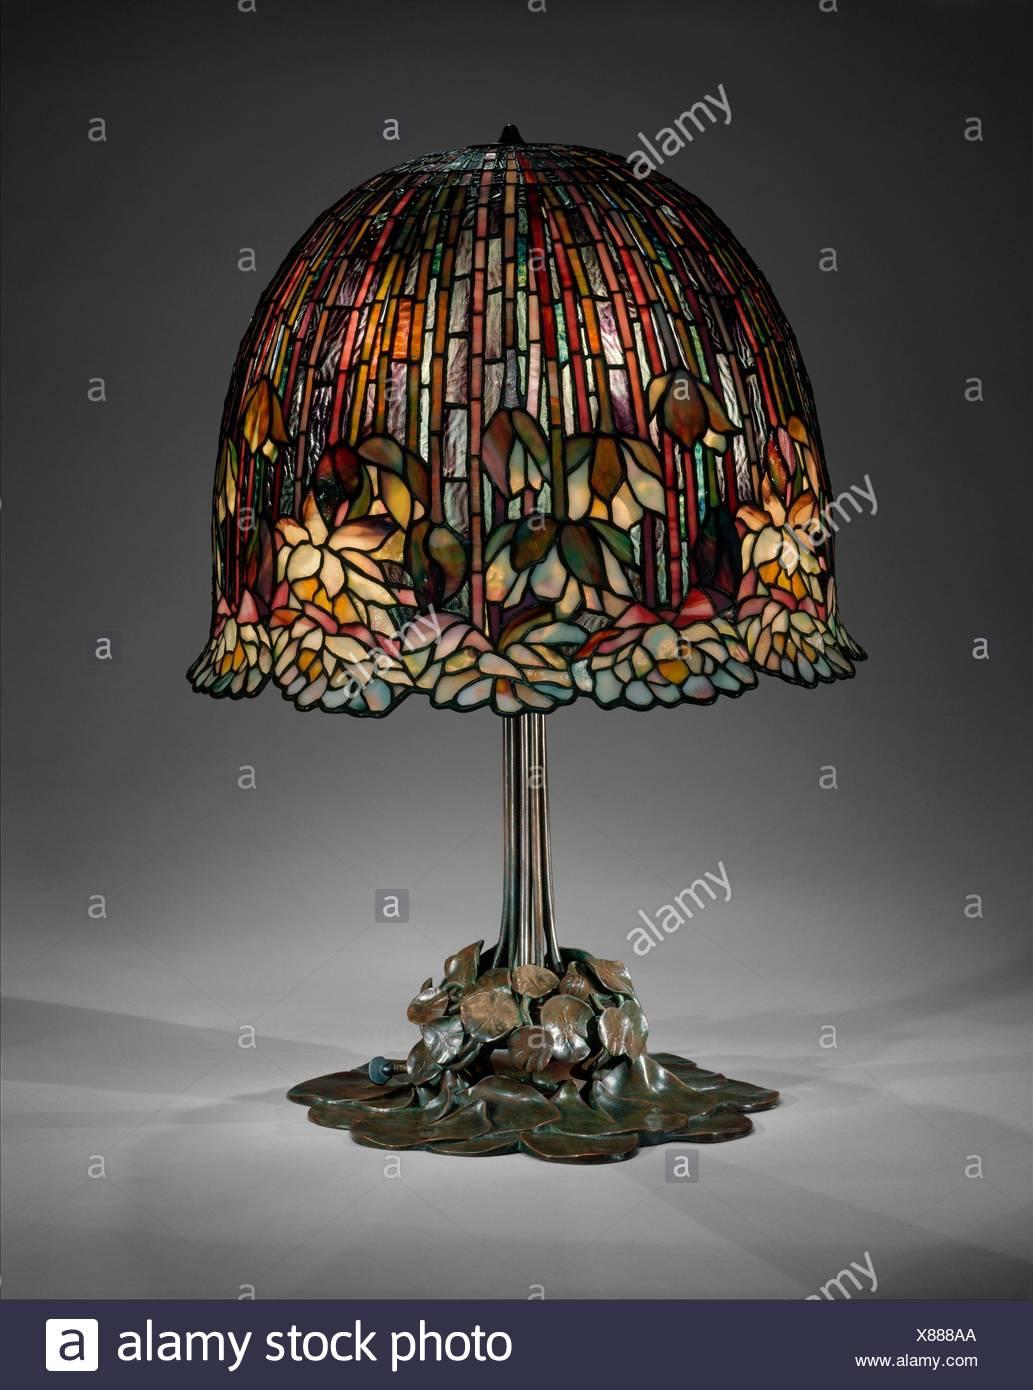 Lampe. Designer: Conçu par Louis Comfort Tiffany (1848-1933, New York New York); bouilloire: Tiffany Studios (1902-32); Date: 1904-15; Photo Stock